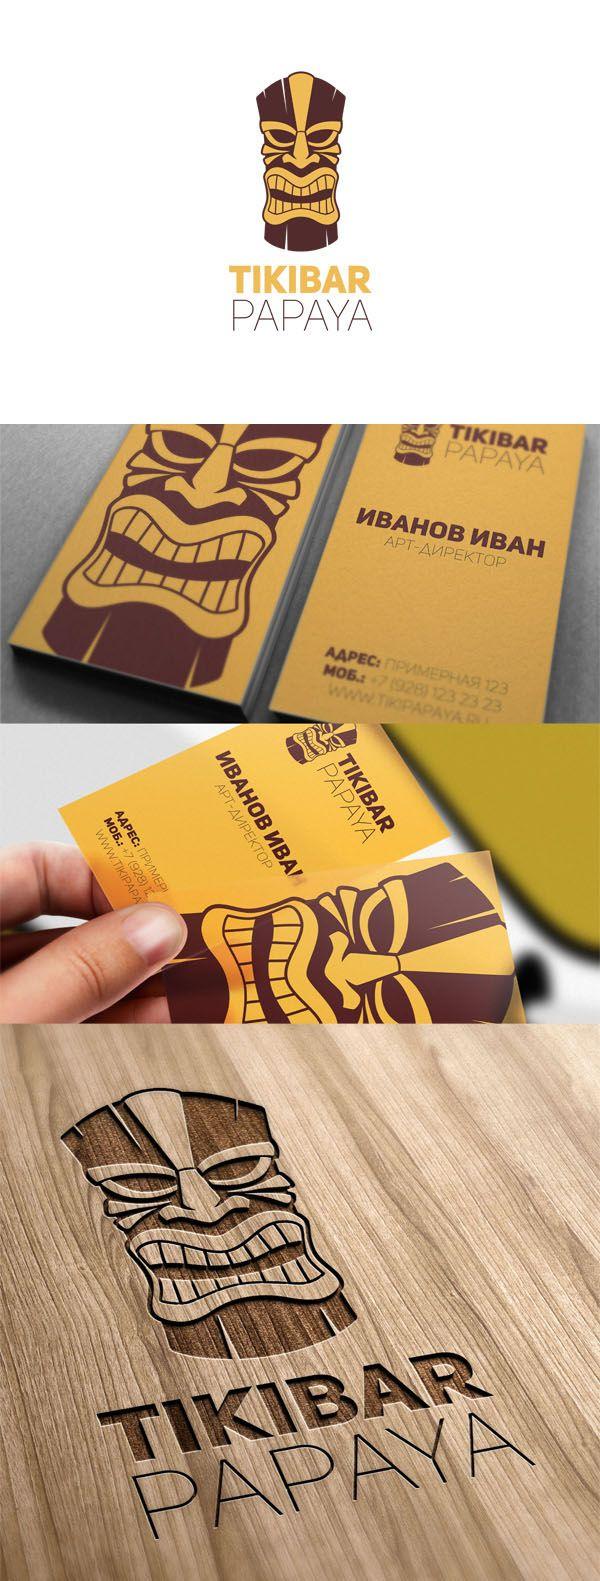 Логотип для бара ТИКИ (Дизайн - Гнездилов Павел г.Краснодар) #logo #logotype #brand #branding #mask #face #hawaii #yellow